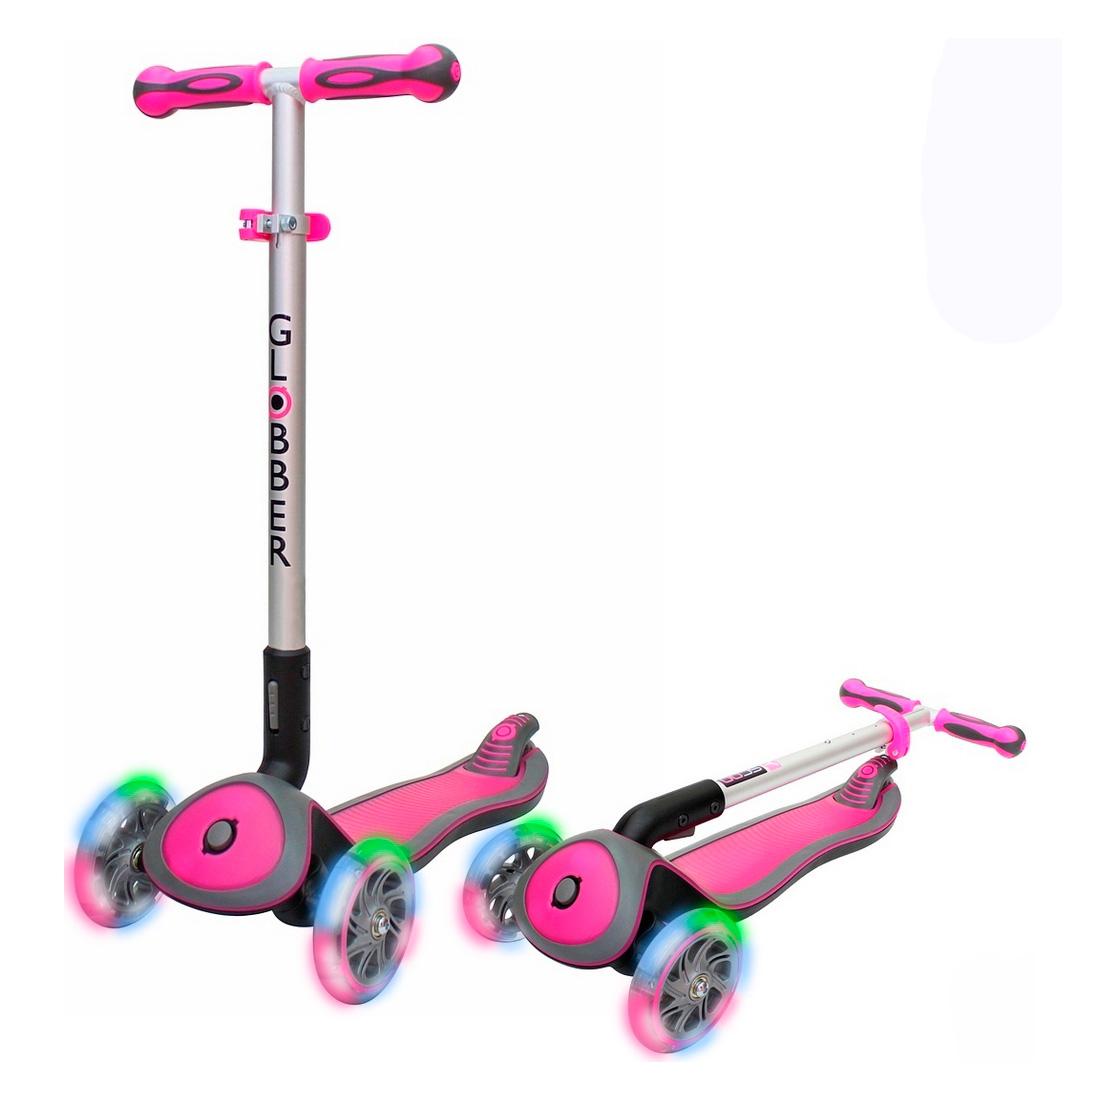 Самокат Globber Elite SL My free Fold up со светящимися колесами Rhodamine розовый<br>